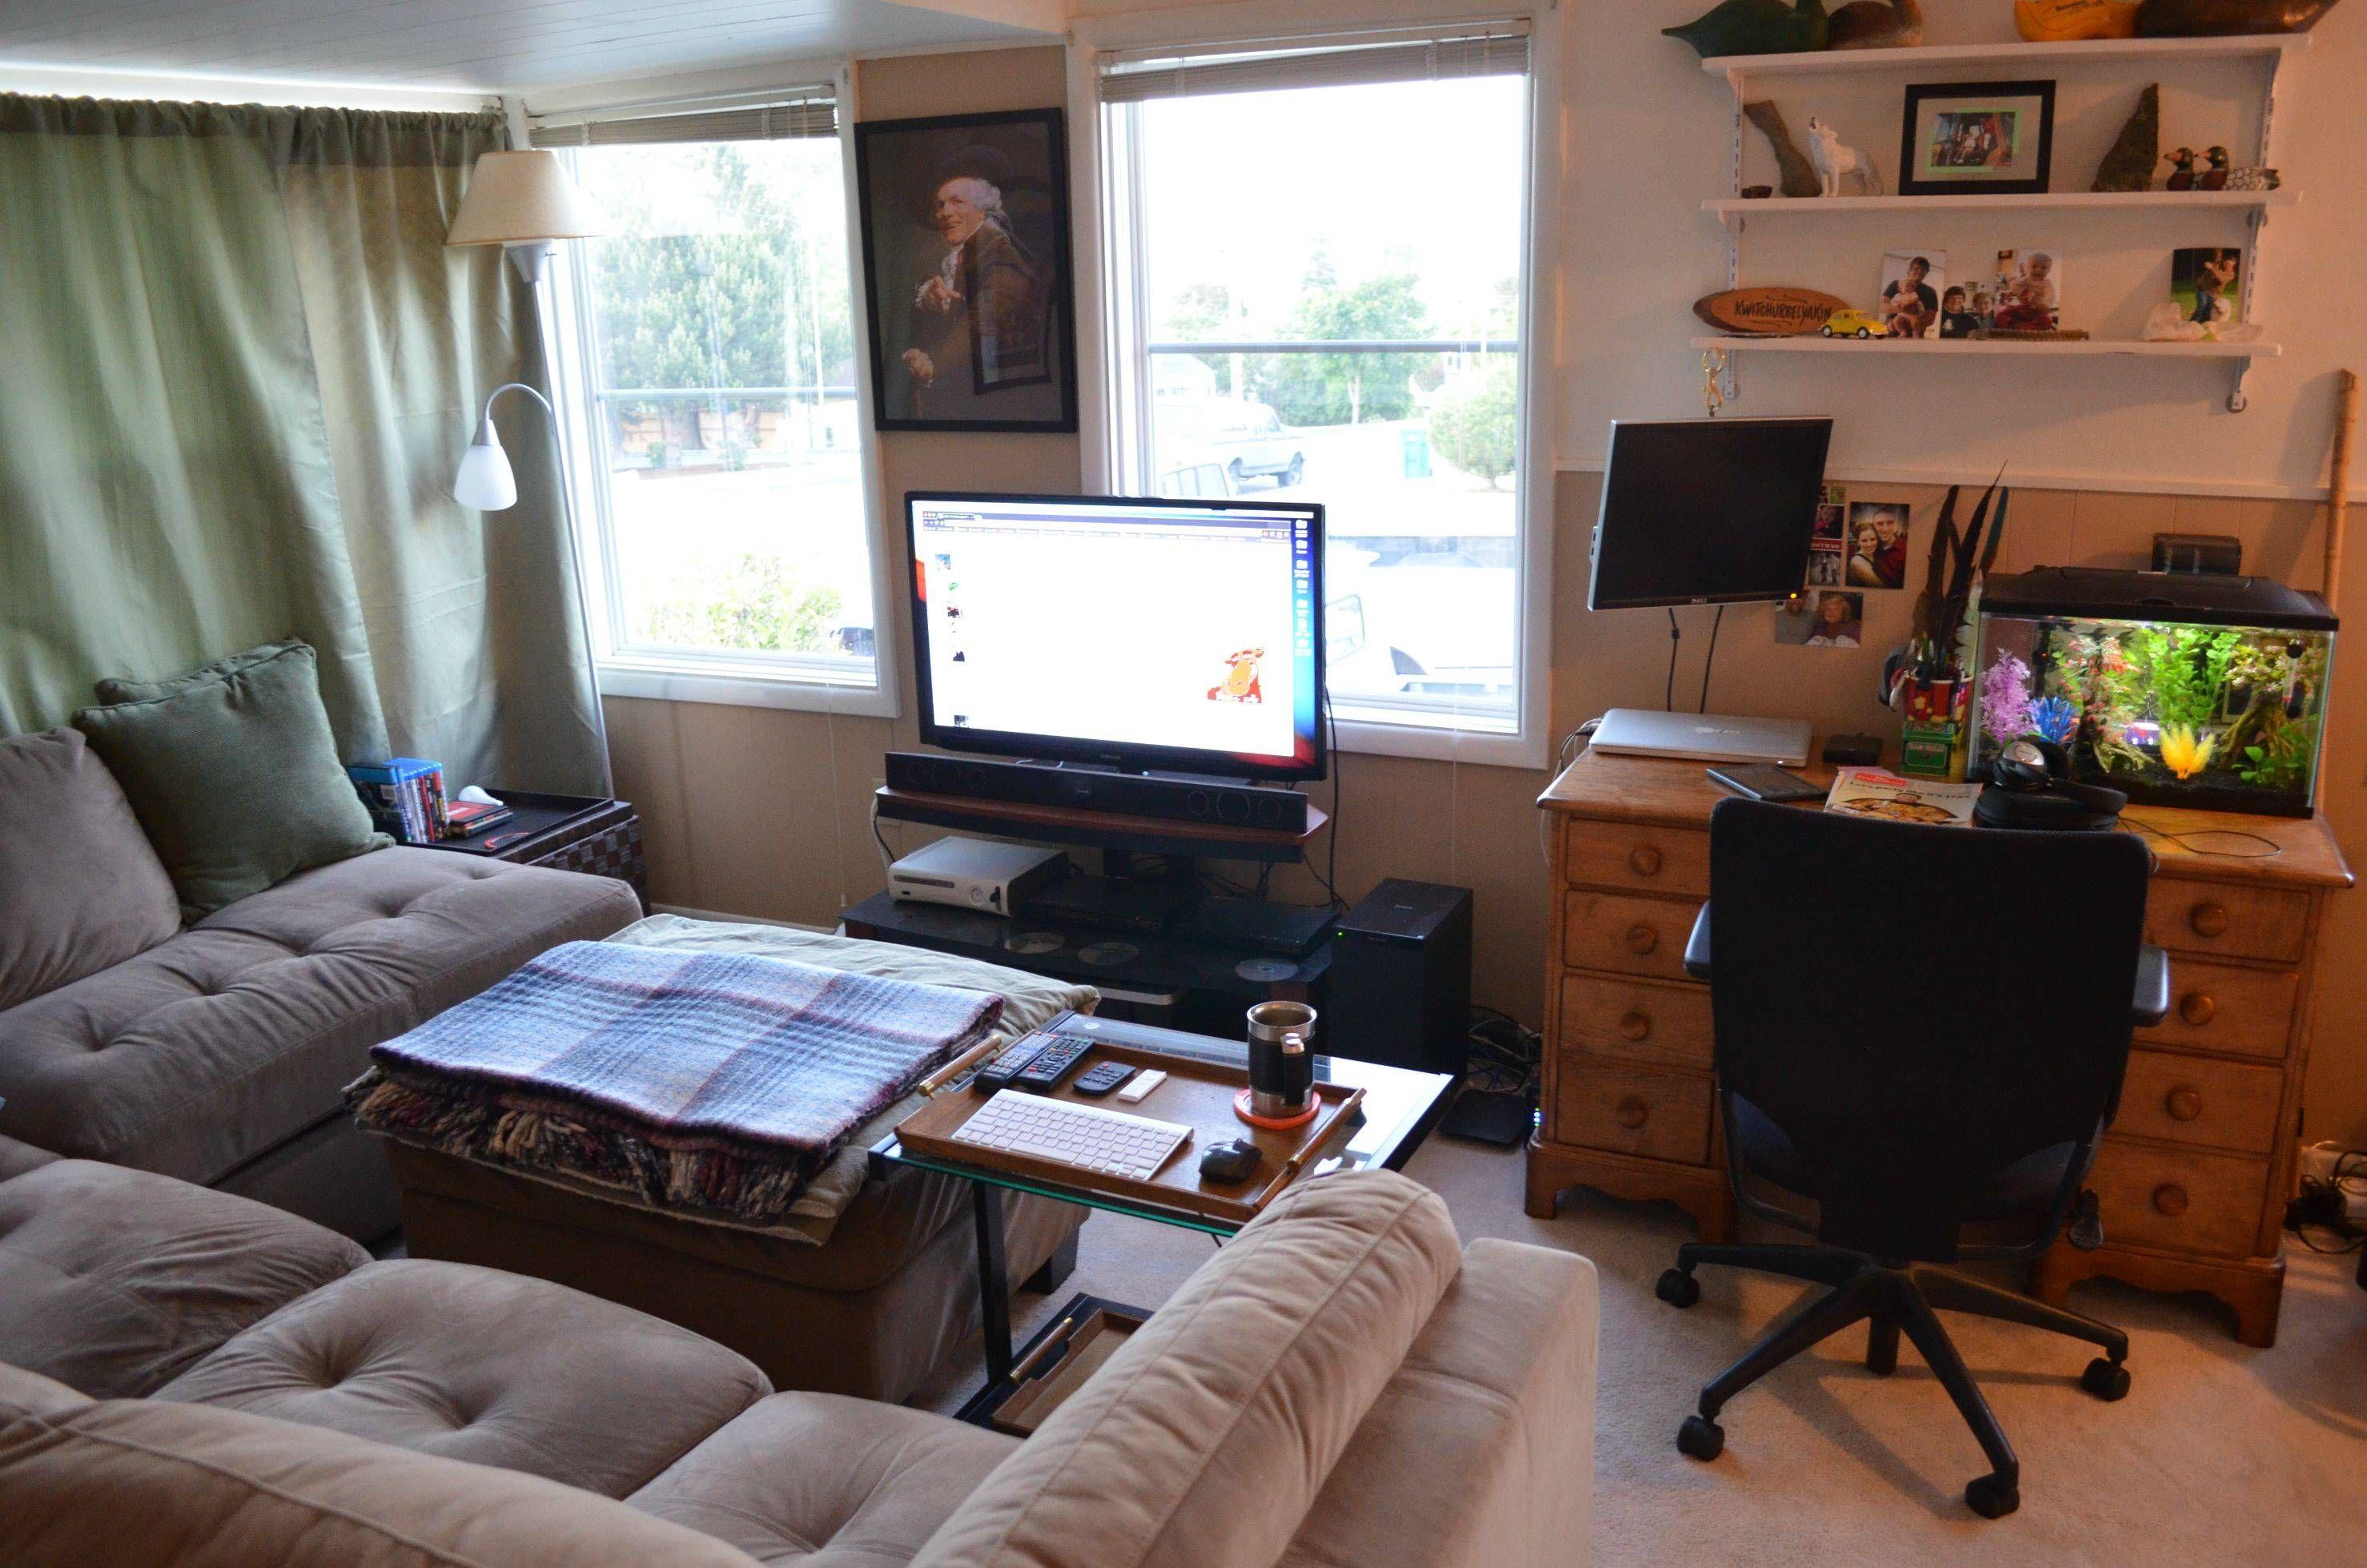 Living Room Ideas Reddit Apartment Living Room Design Pinterest Living Room Apartment Interior